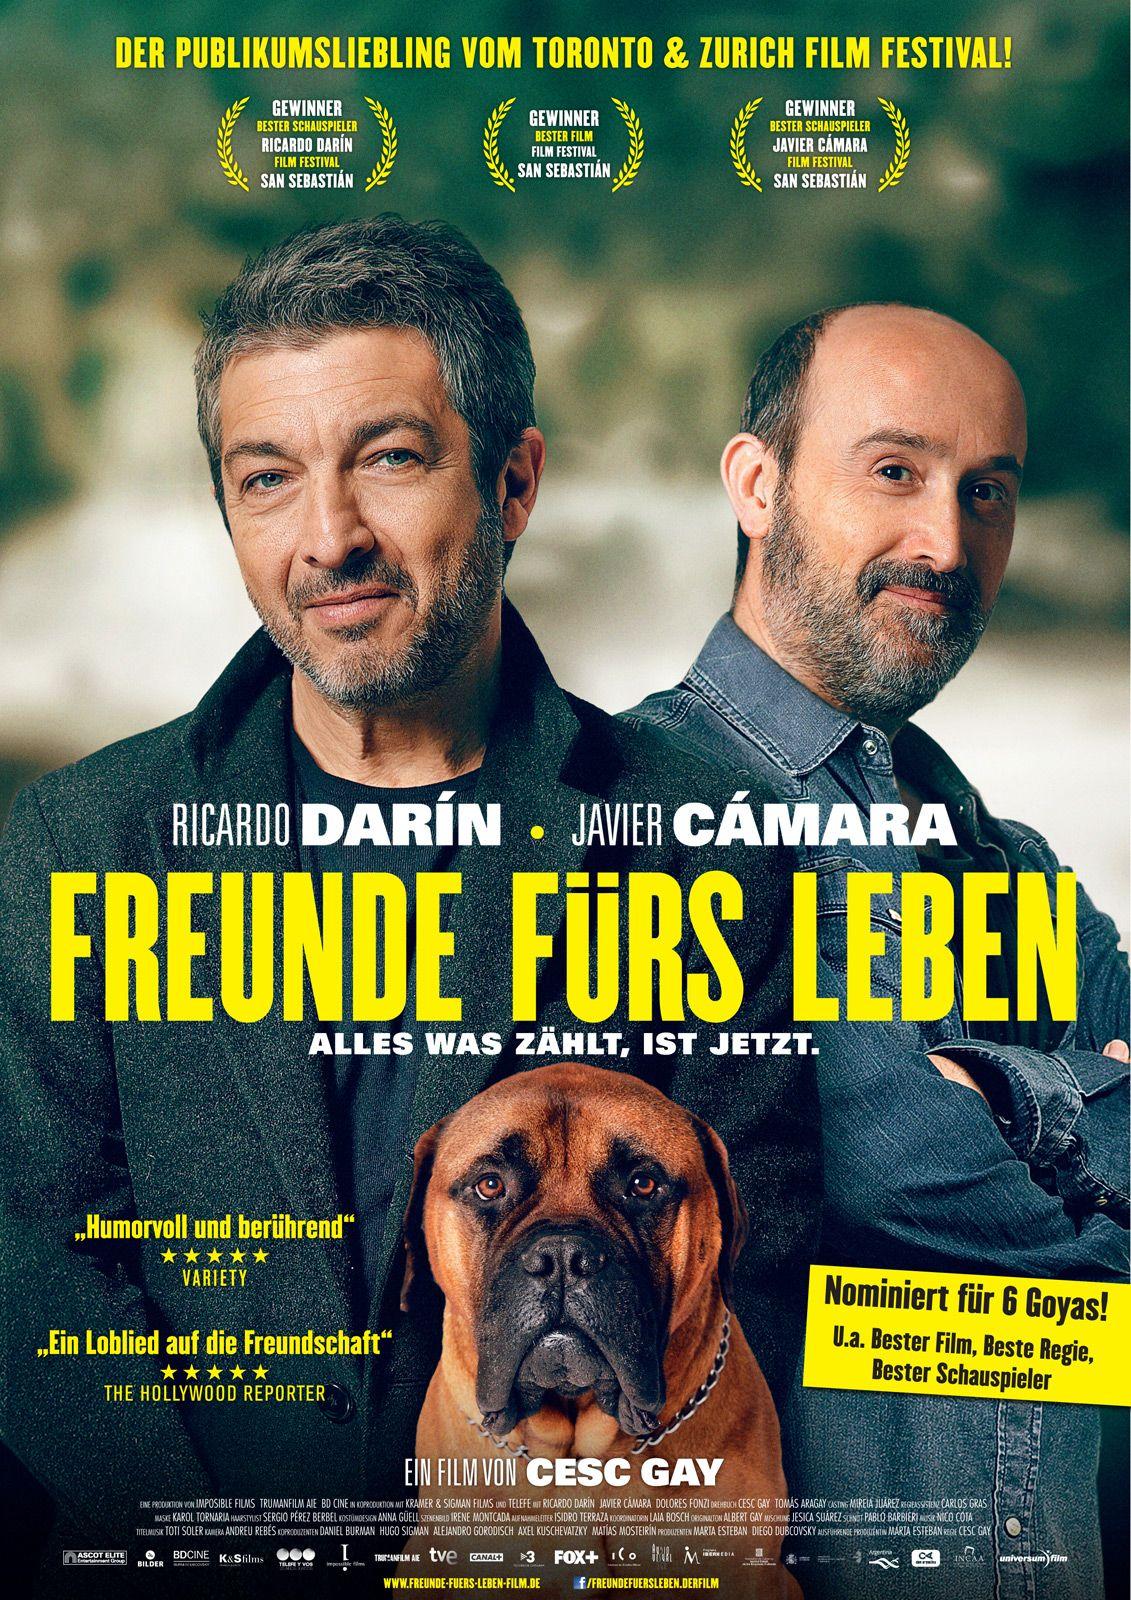 Freunde fürs Leben - Film 2015 - FILMSTARTS.de | Filme | Pinterest ...